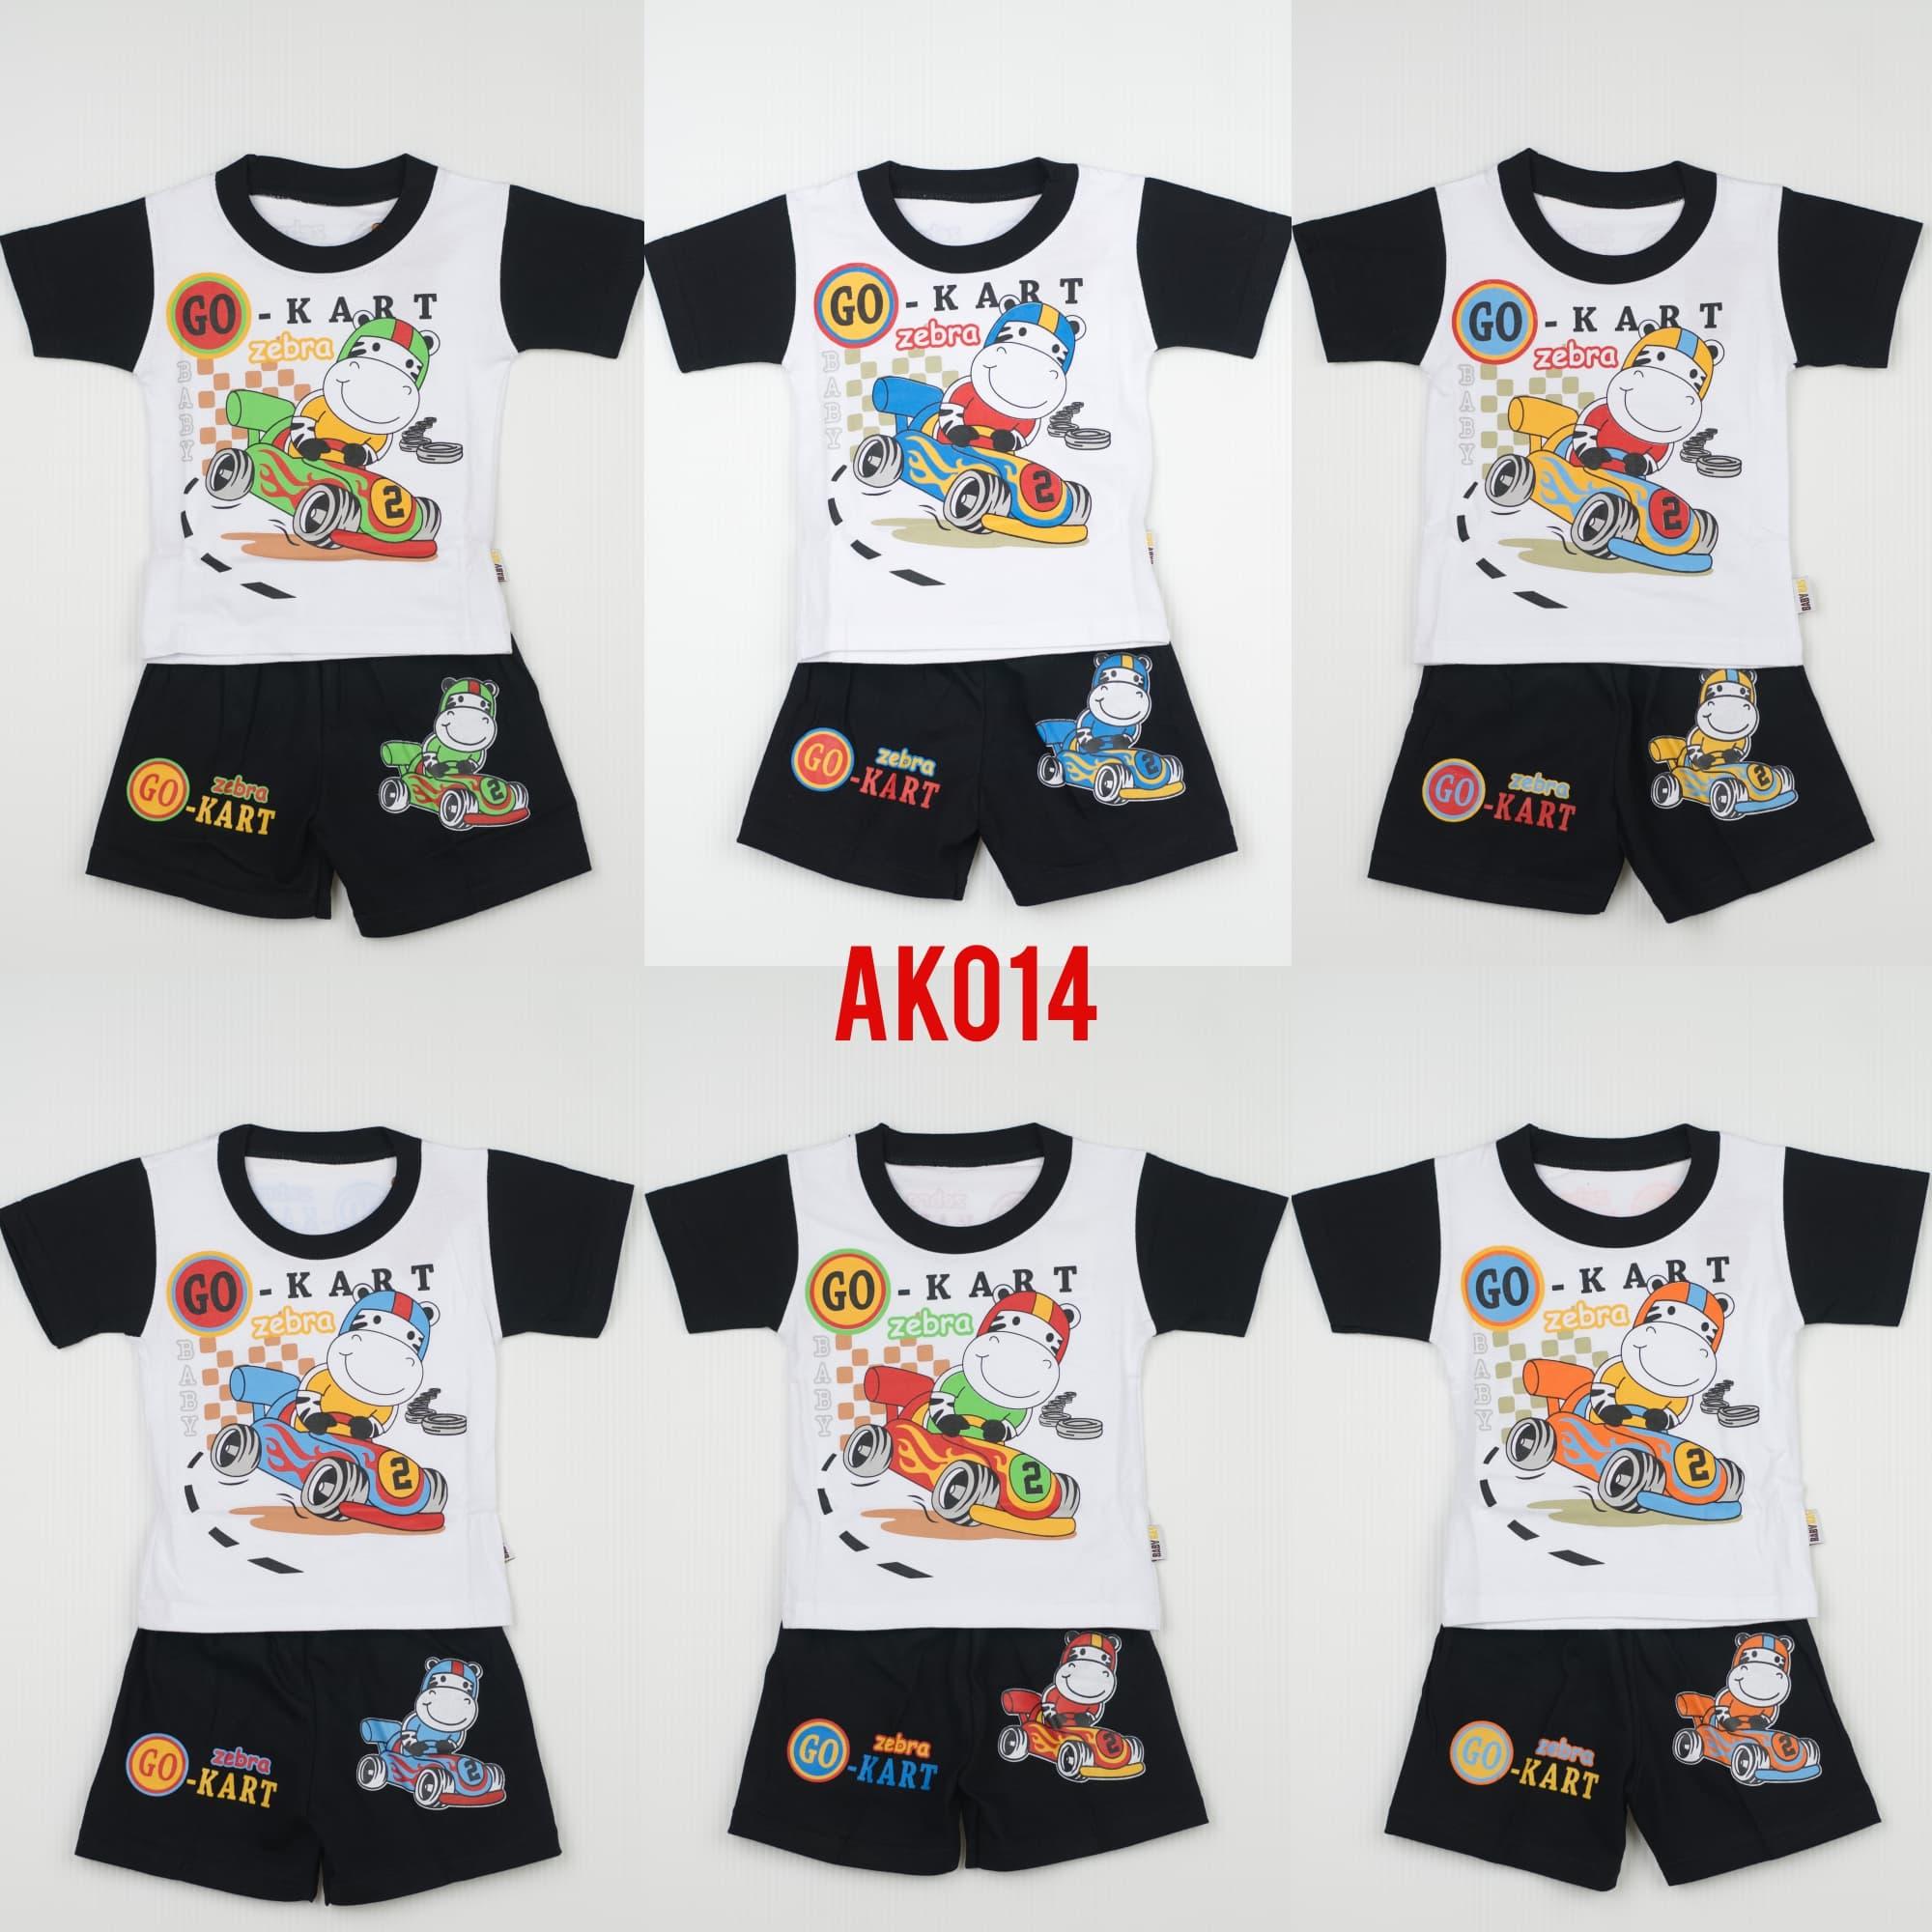 Jual Setelan Baju Kaos Anak Laki size Baby Slam Dunk AK012 BABY BAS Kids Clothing